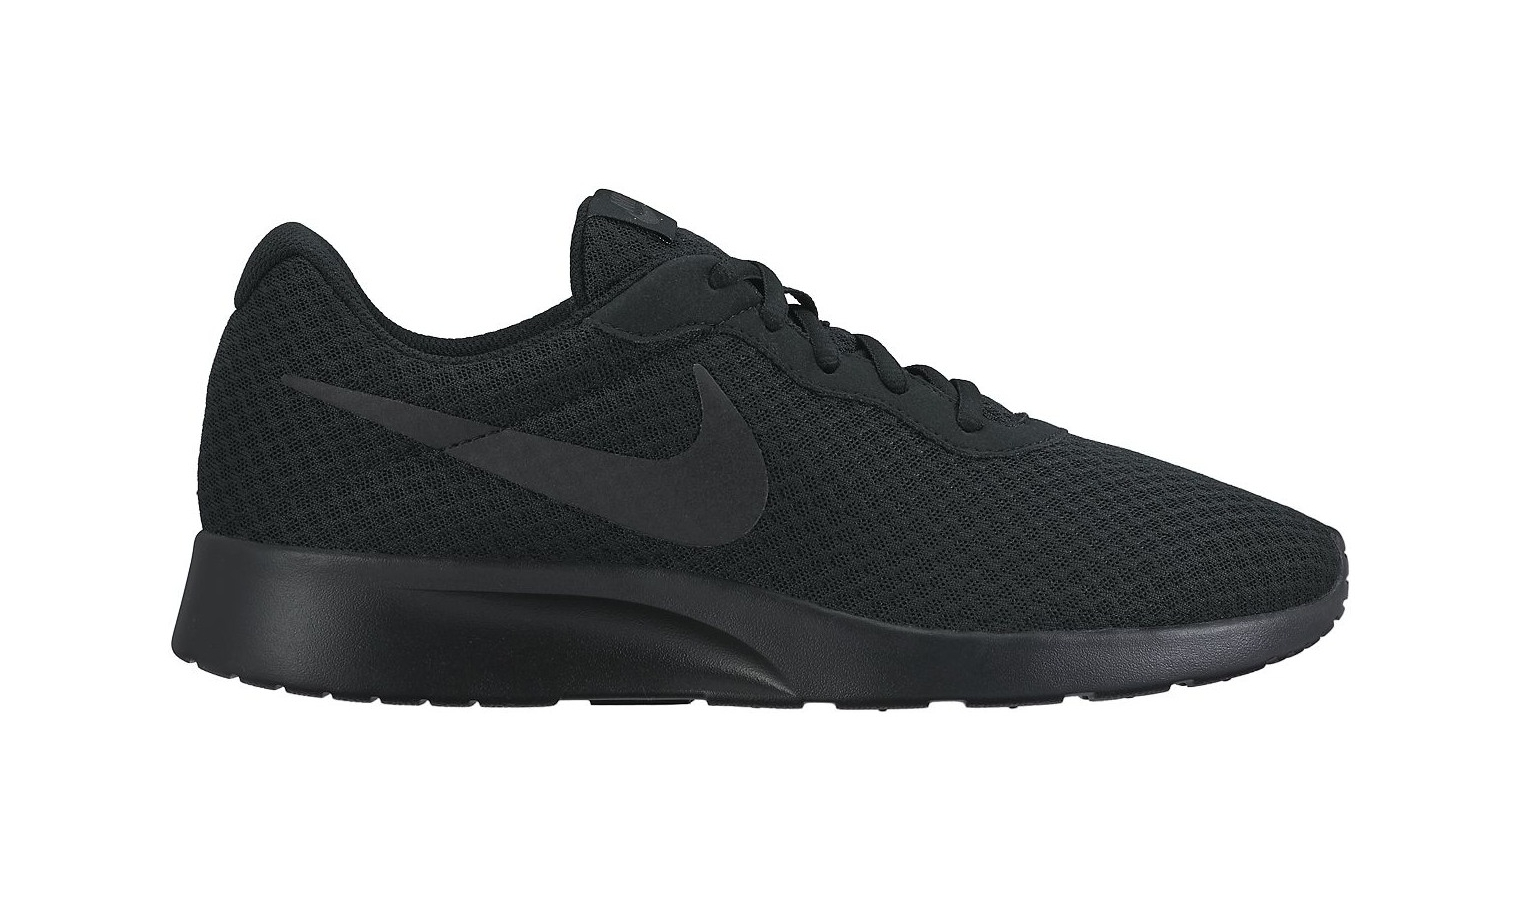 Pánske topánky Nike TANJUN čierne  24907725d6